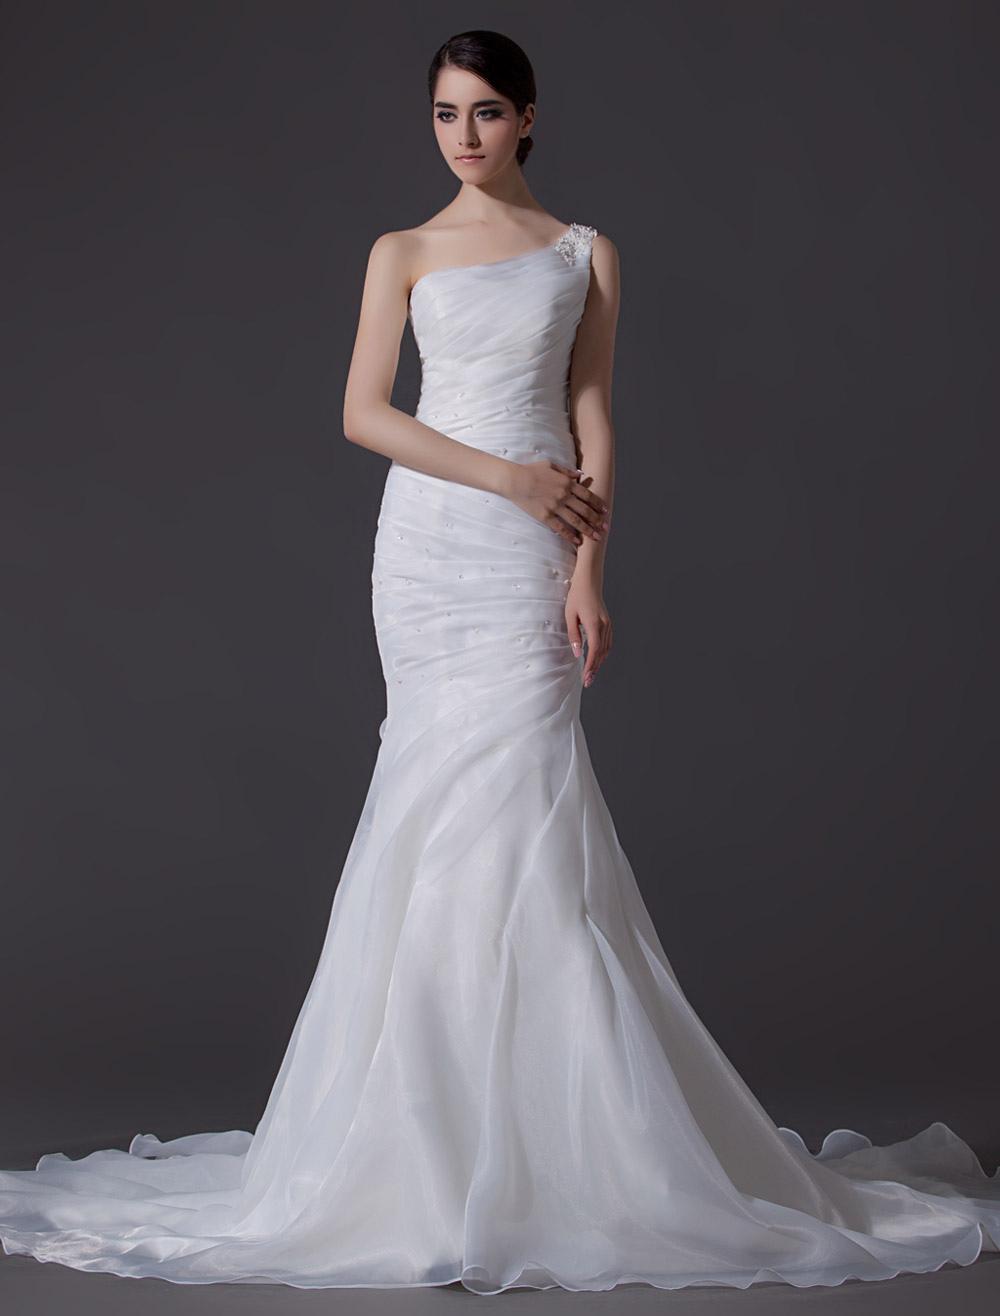 Ivory One Shoulder Ruched Organza Mermaid Wedding Dress